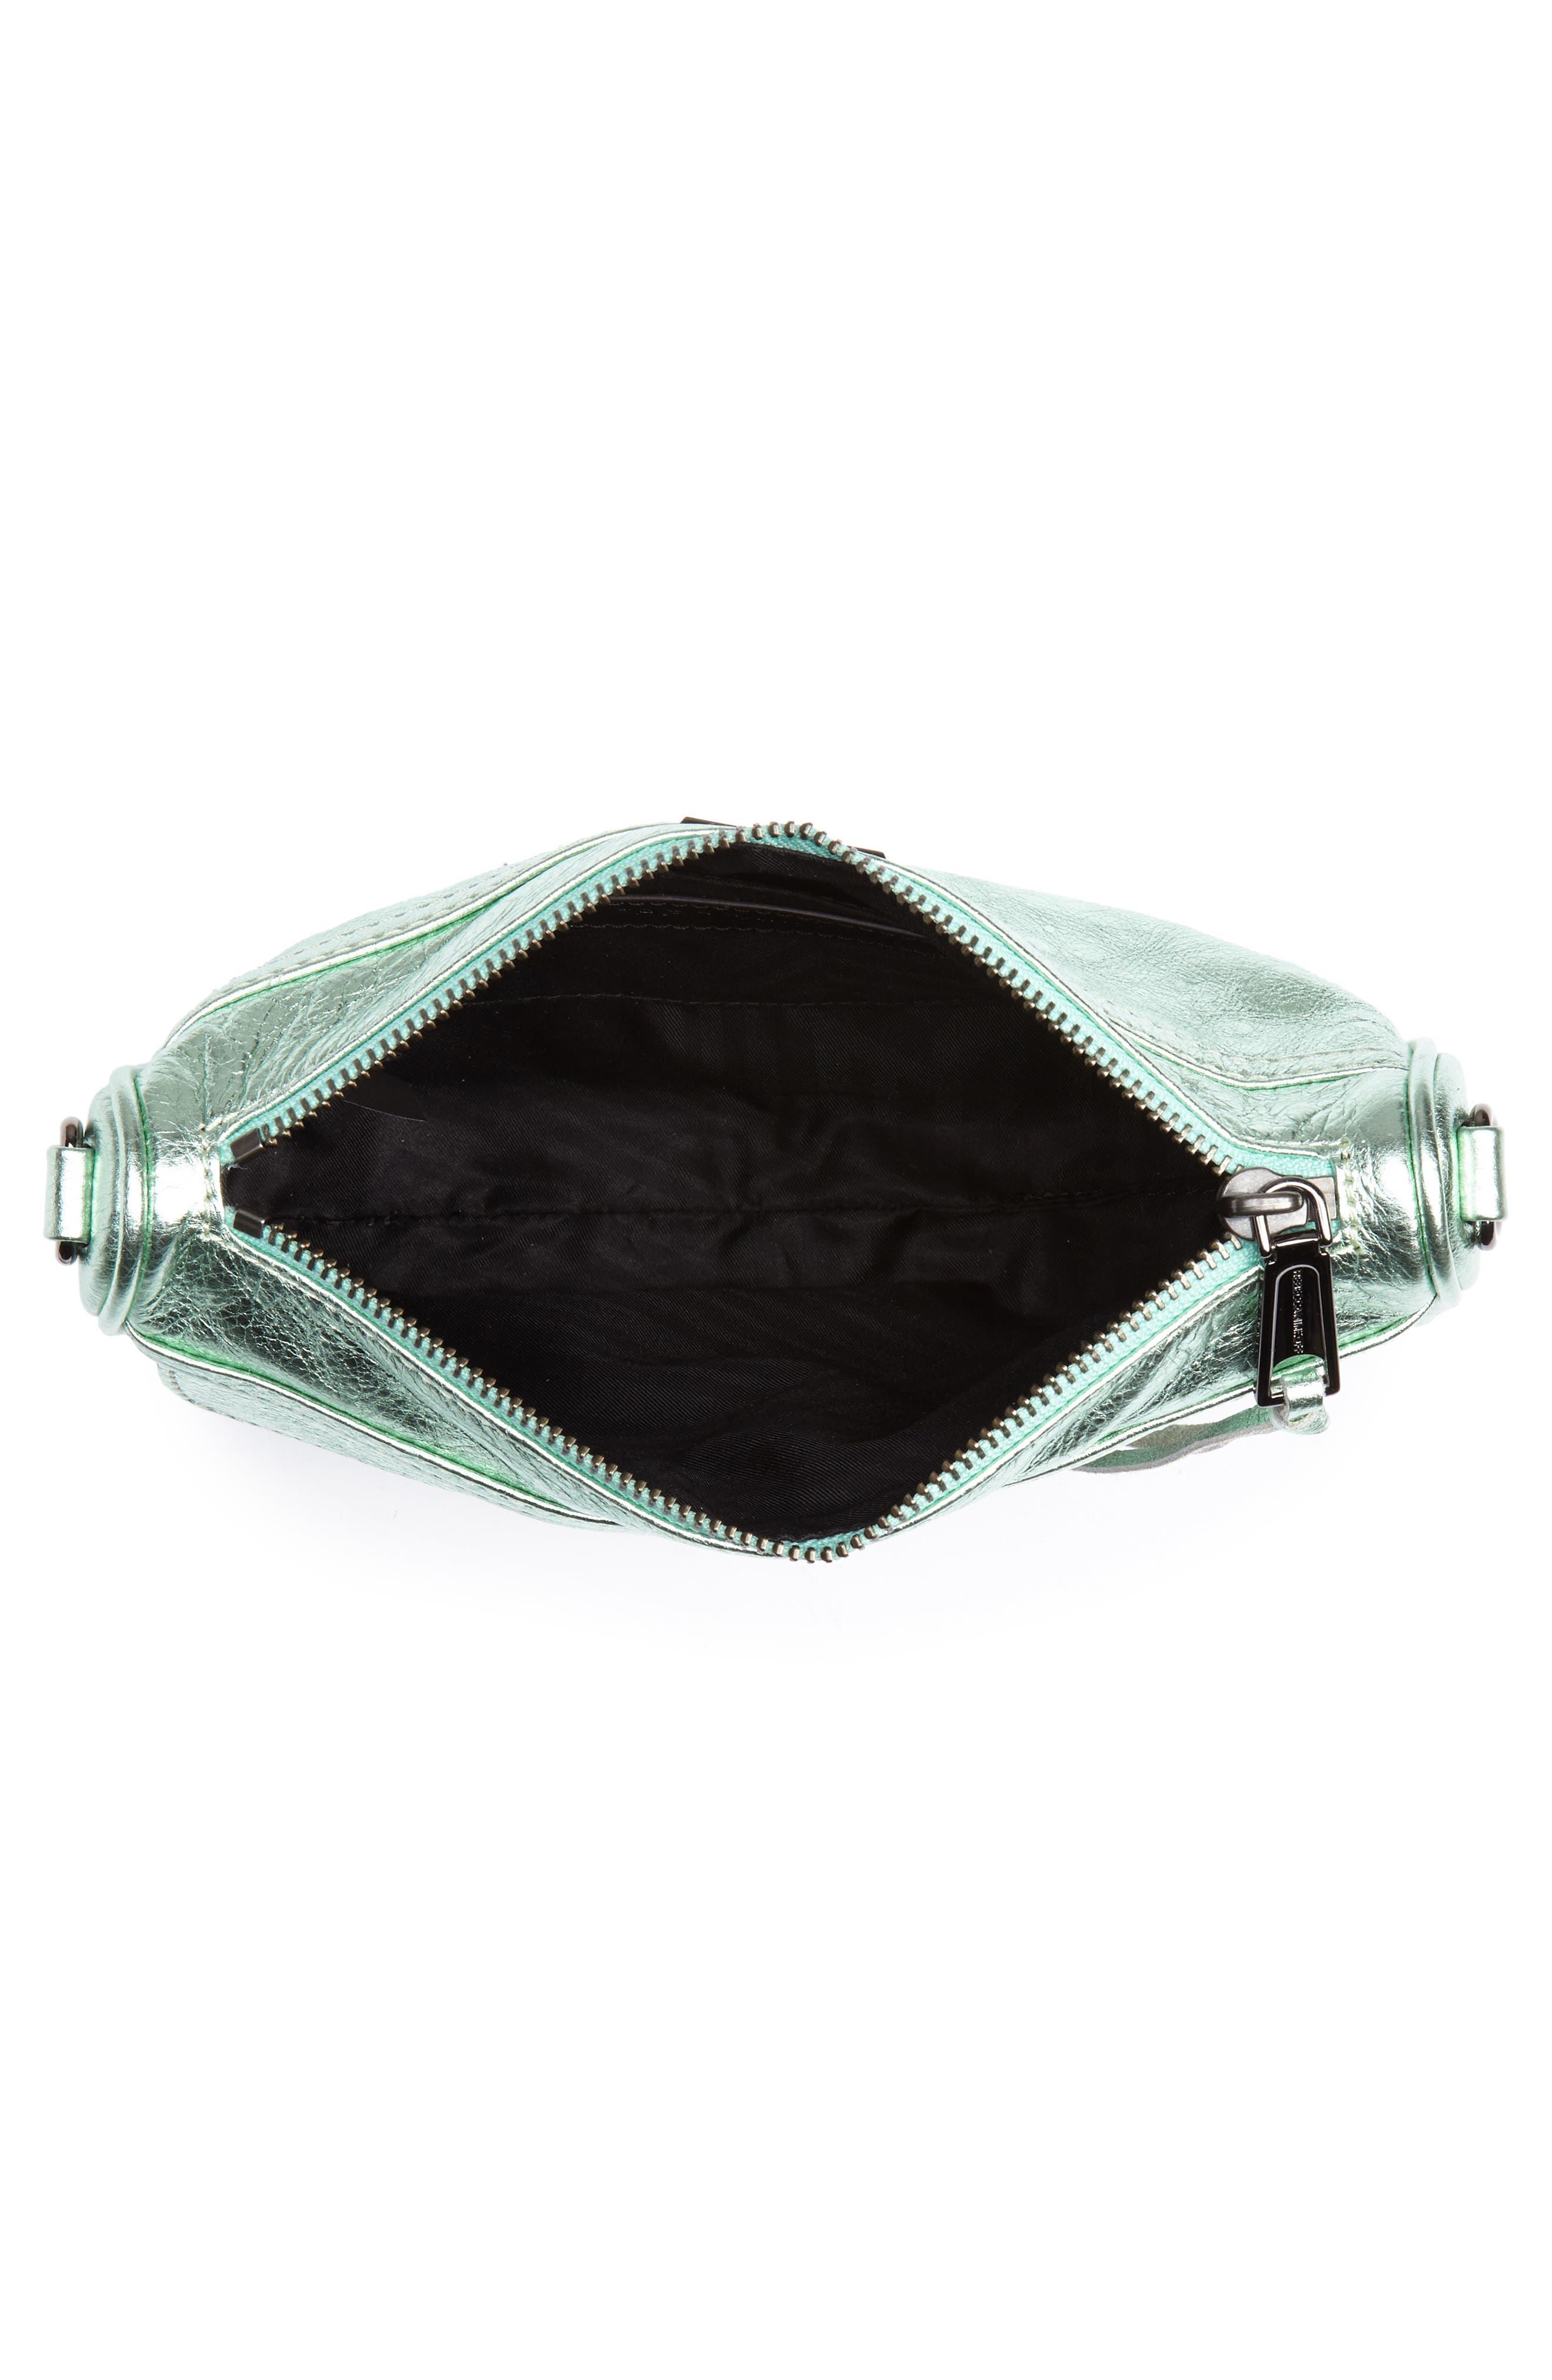 Mini MAC Metallic Leather Convertible Crossbody Bag,                             Alternate thumbnail 4, color,                             Mint